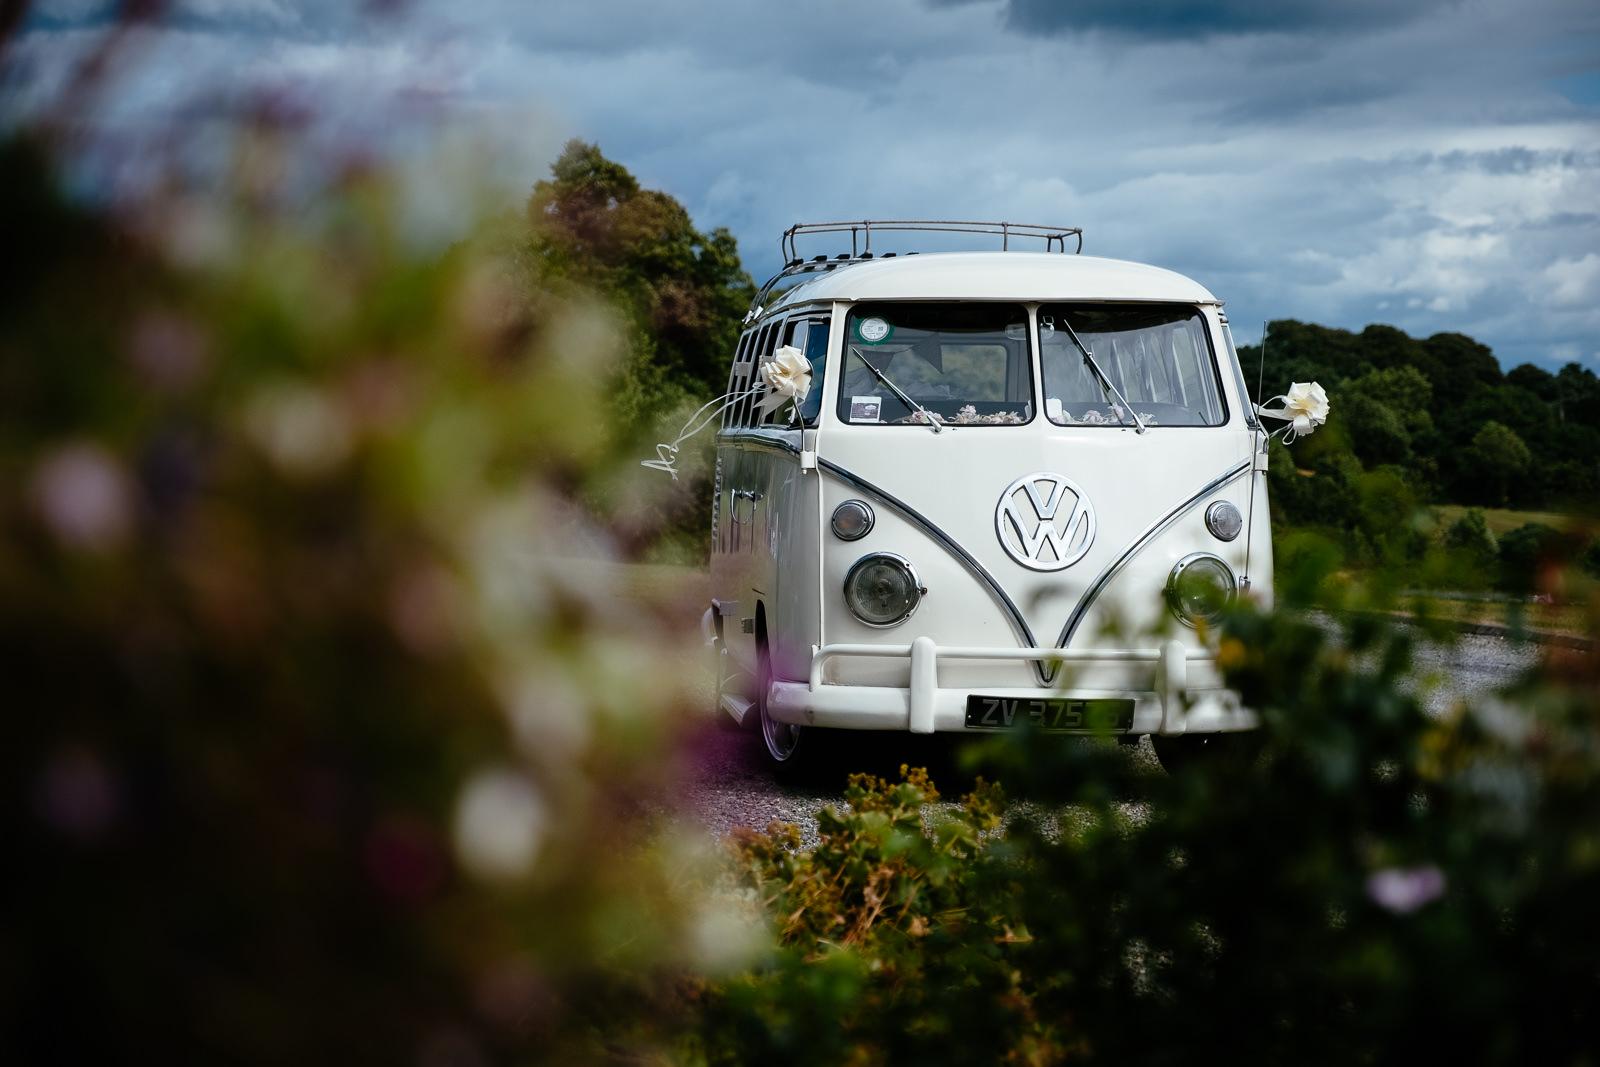 vw classic van at wedding